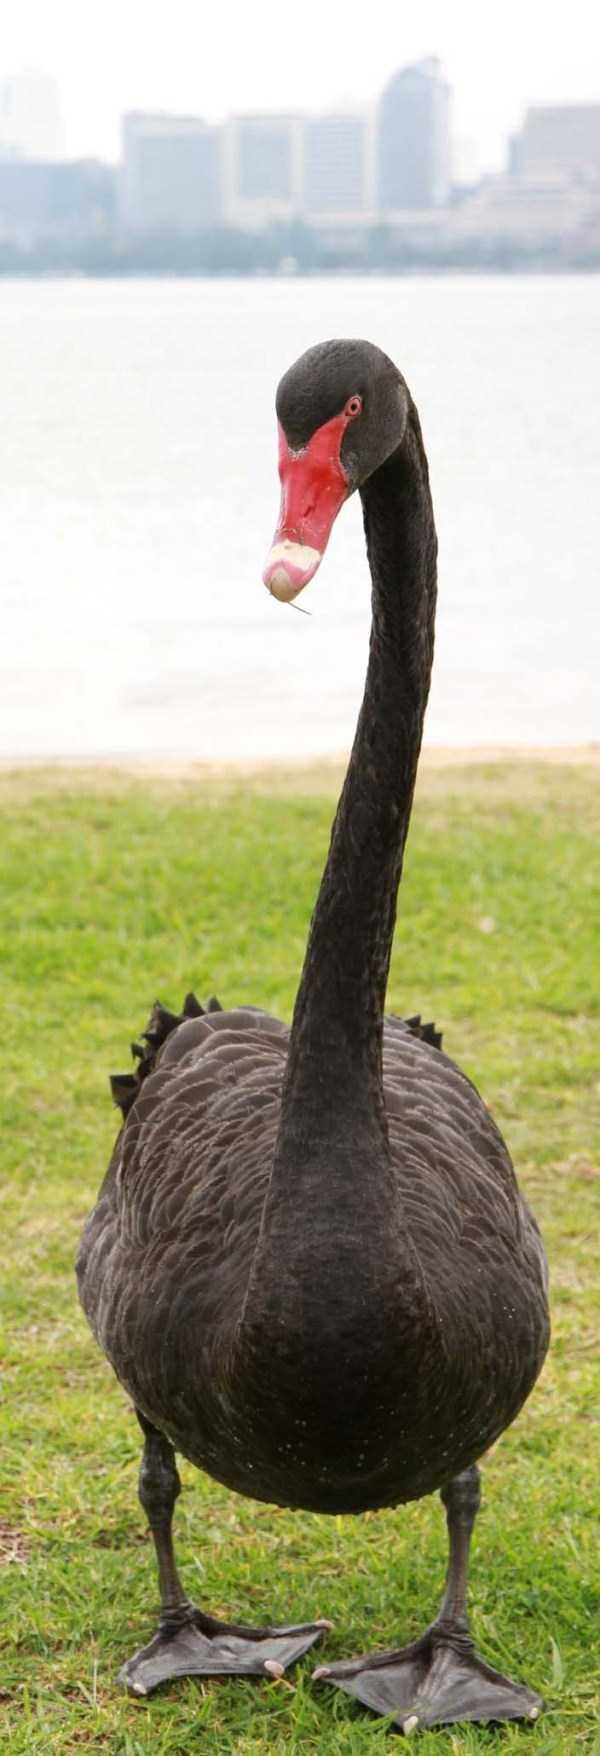 black-swan-photos (18)